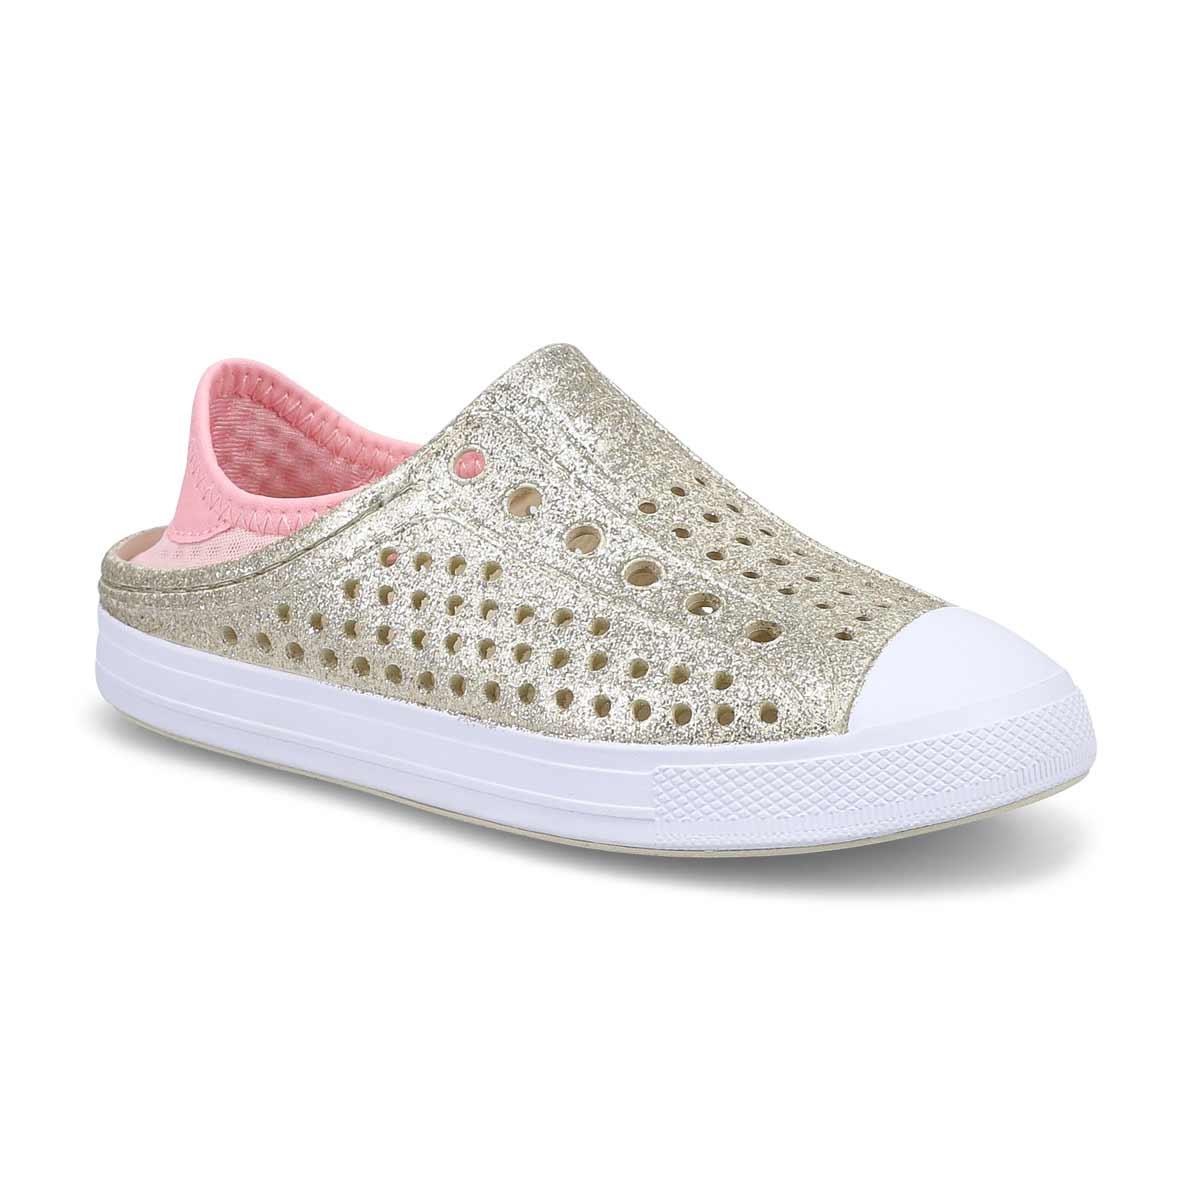 Girls' Guzman Steps Glitter Mist Shoe - Champagne